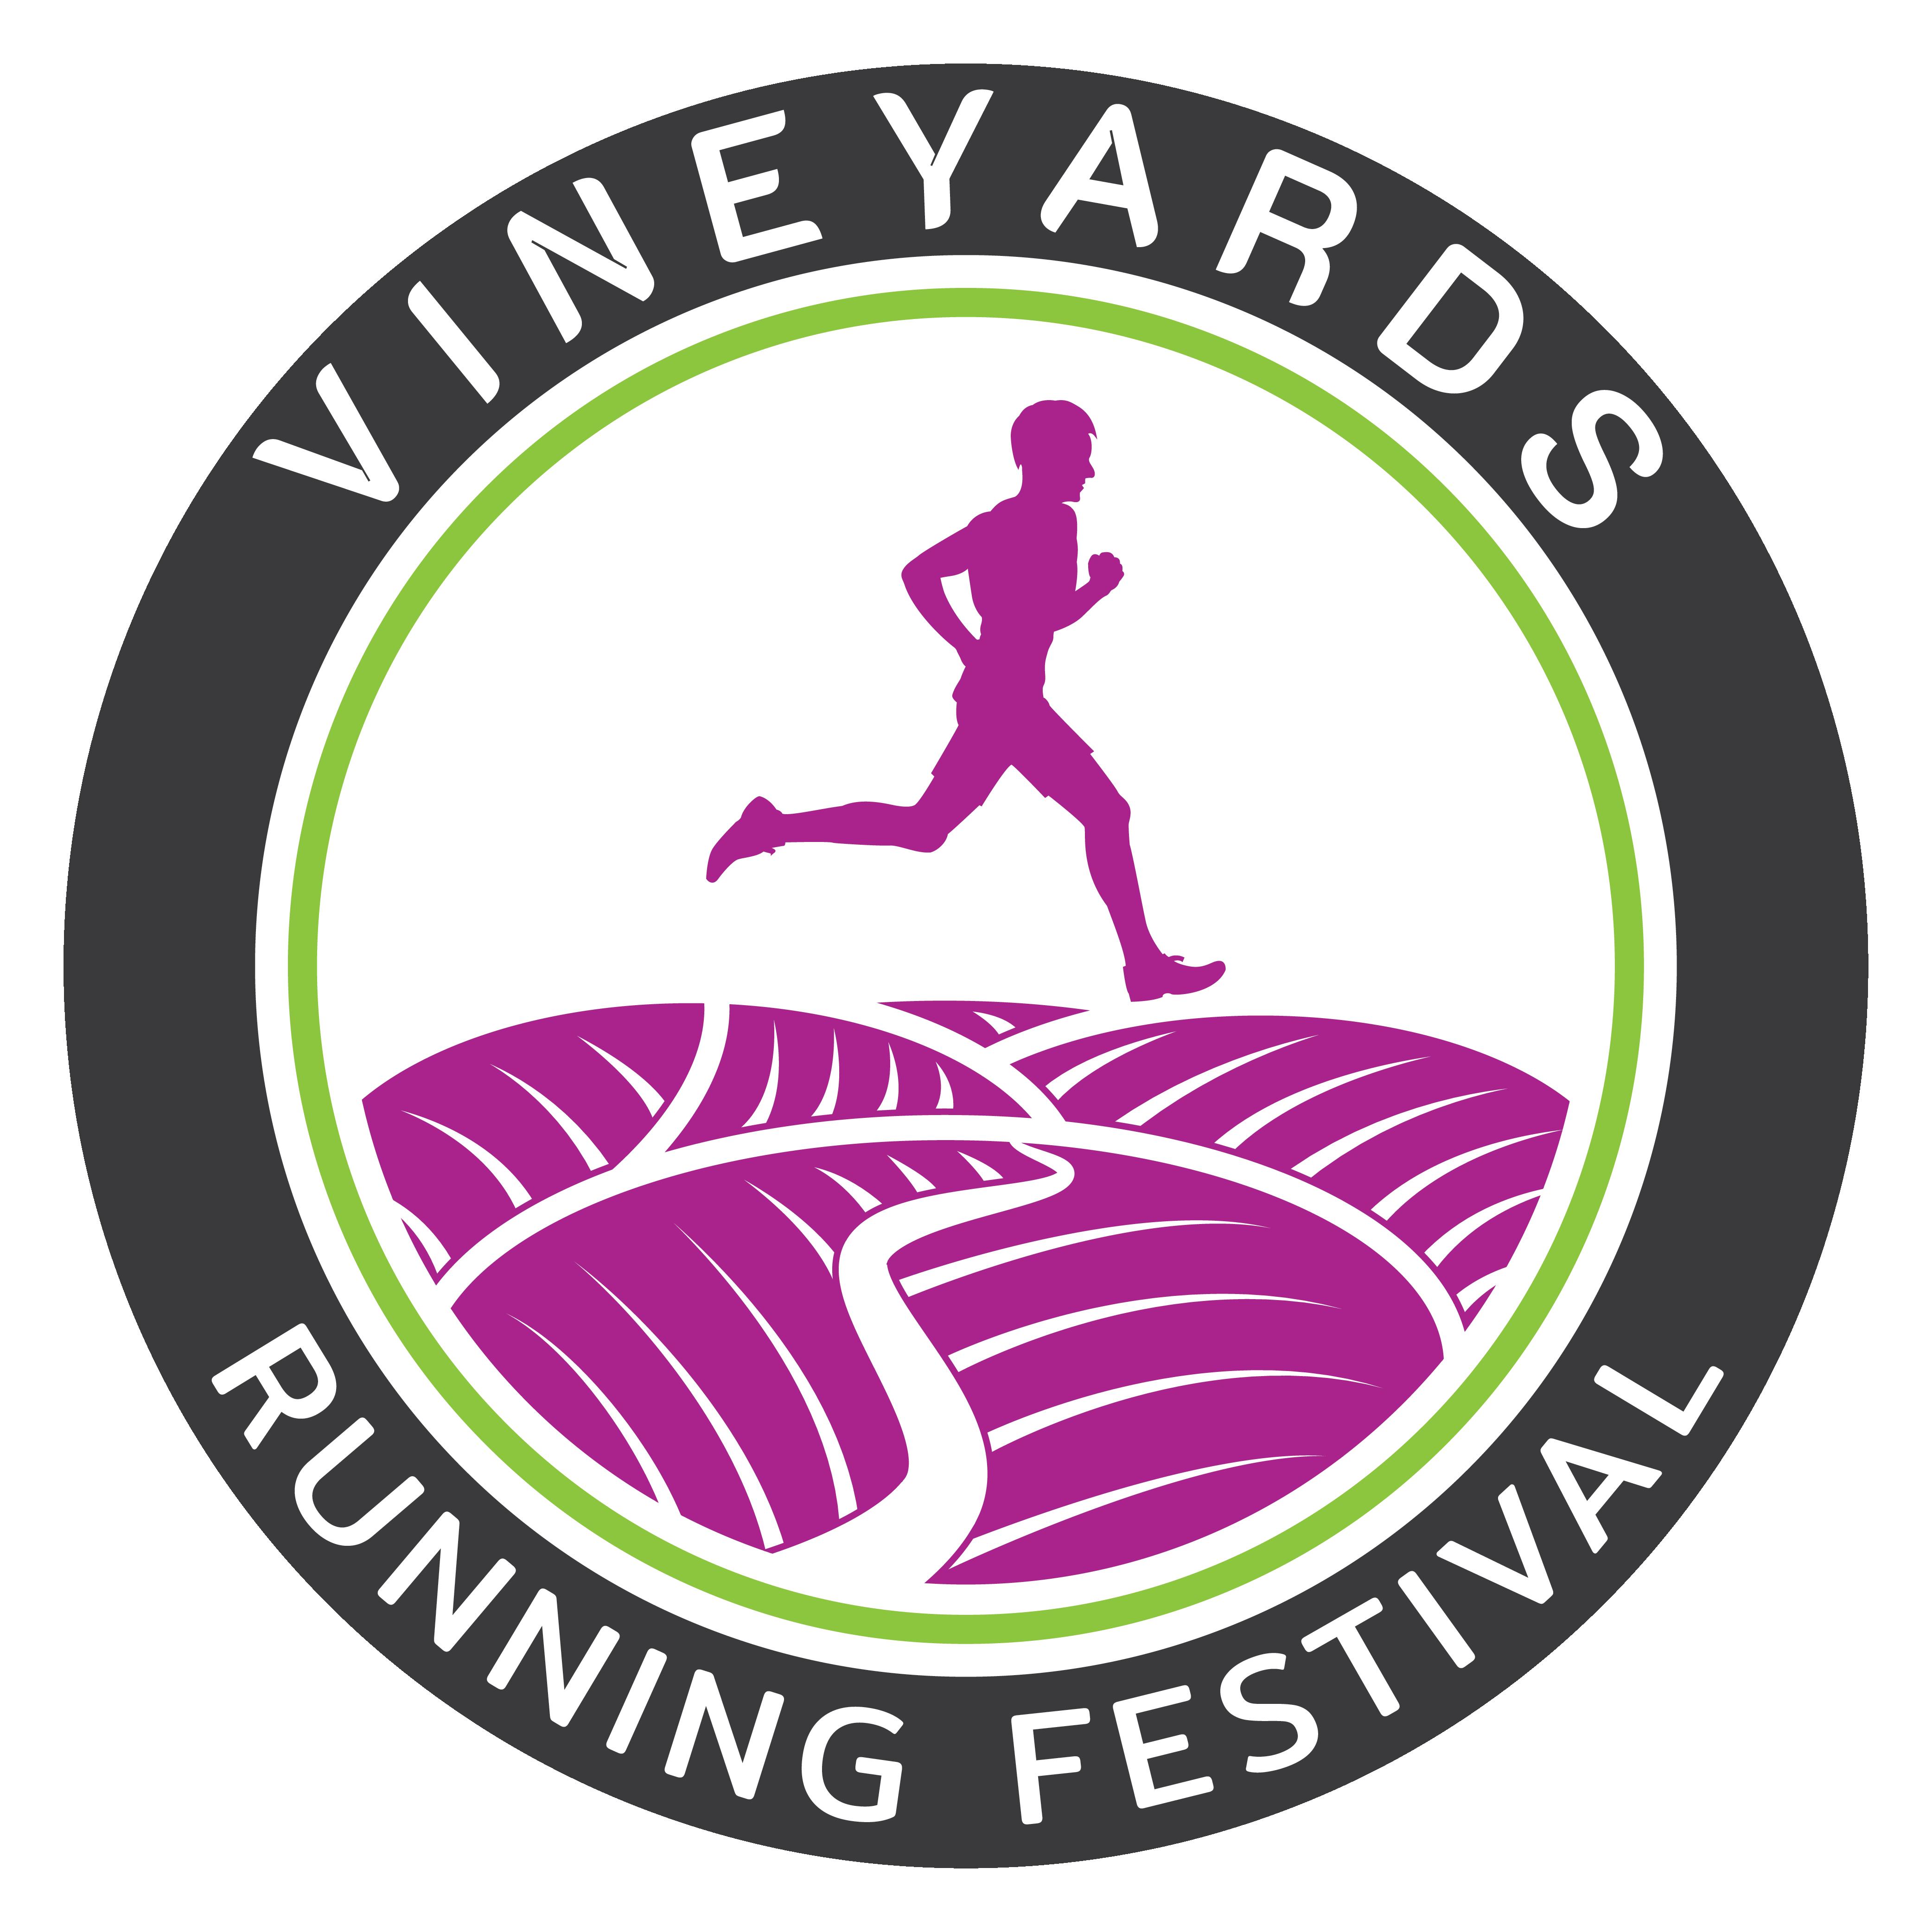 Vineyards Running Festival